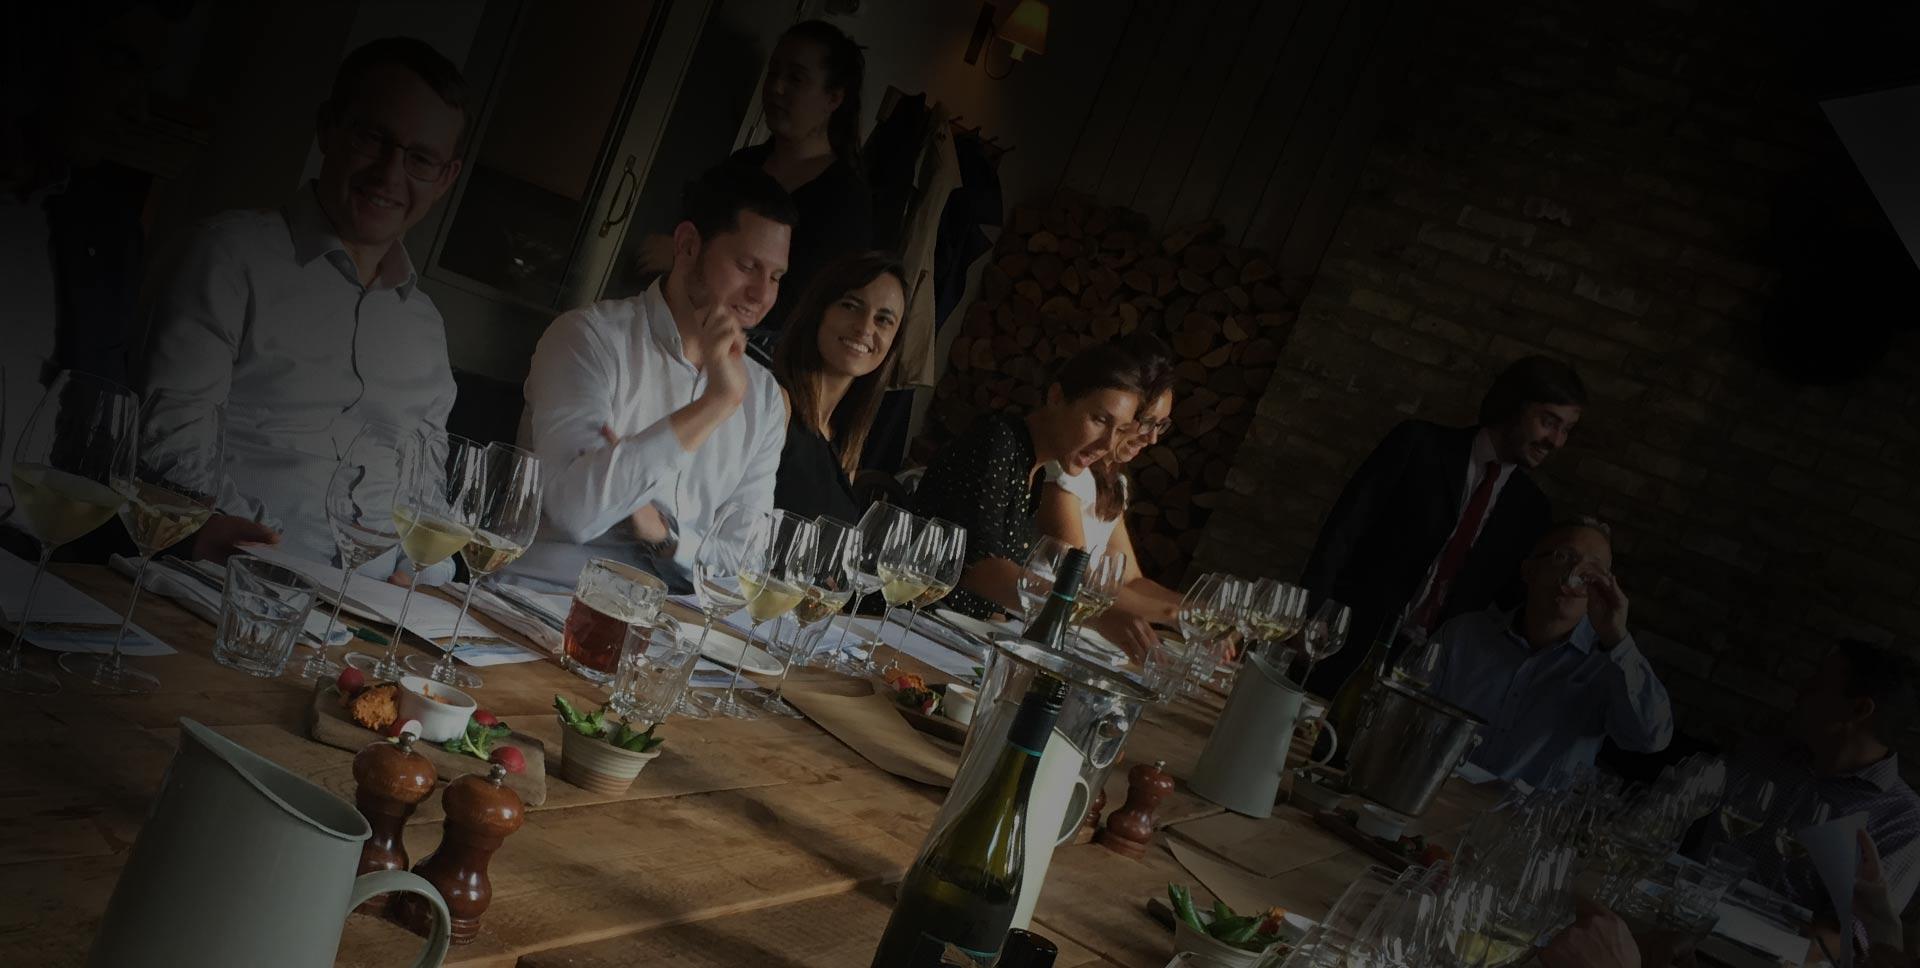 Corney and Barrow Wine Trade